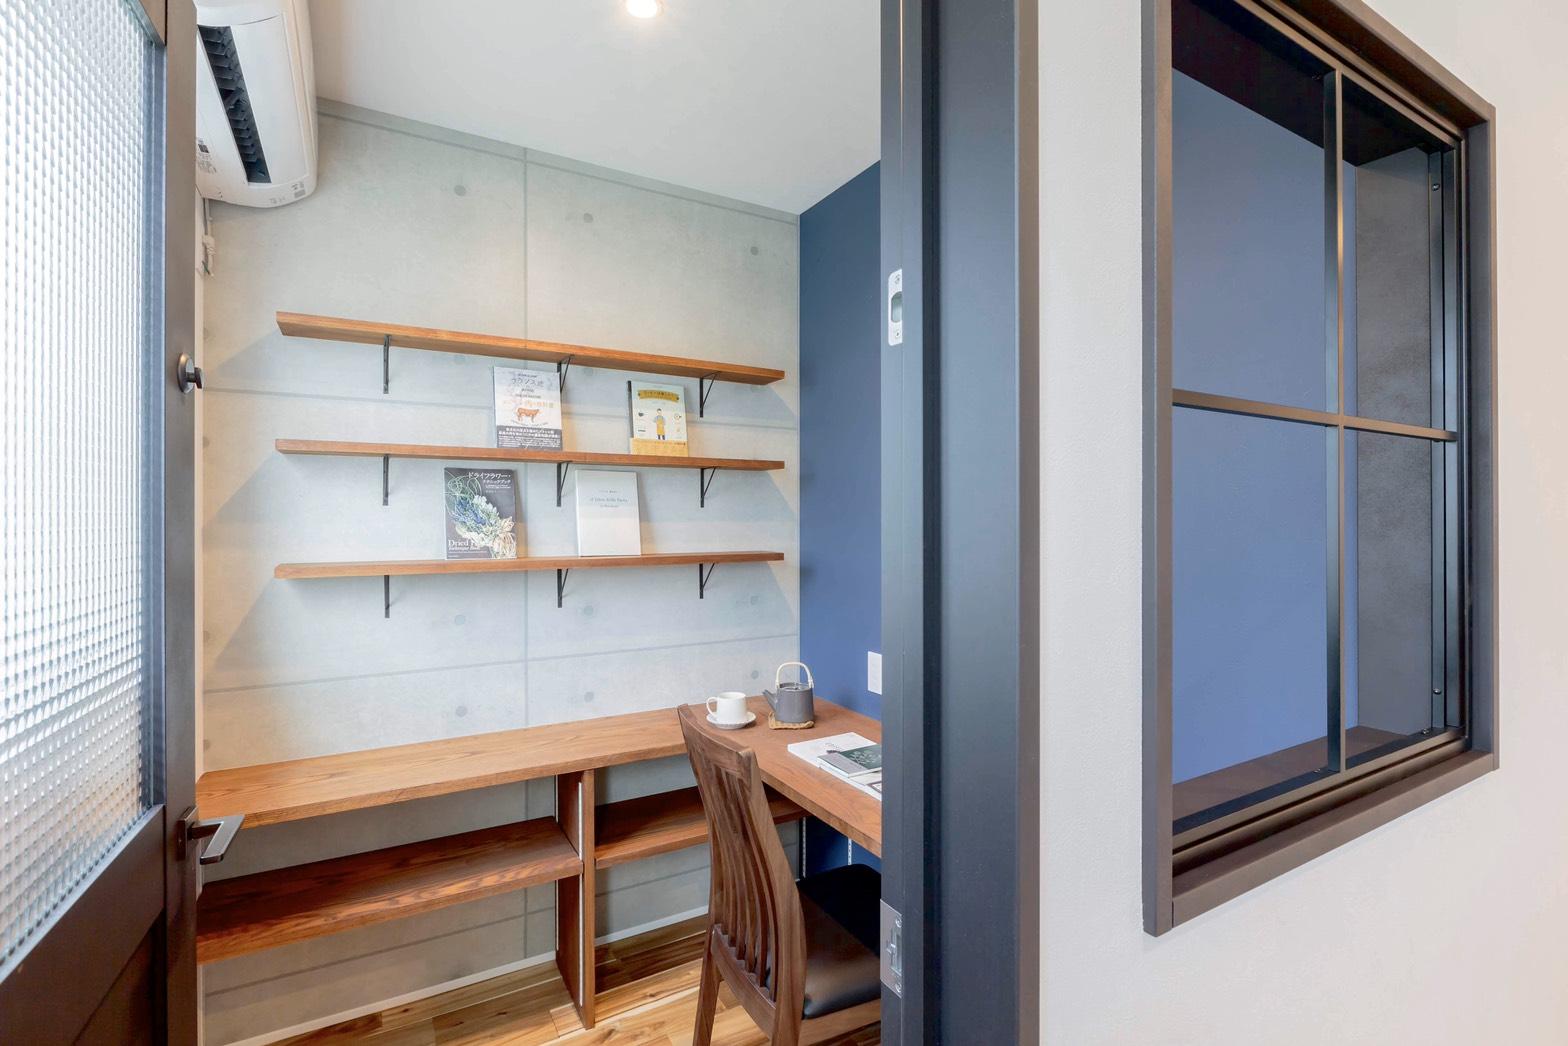 ARRCH アーチ【省エネ、間取り、建築家】2階の書斎はご主人念願の「こもり部屋」。自分と「相対(アイタイ)」するプライベートな時間と空間を確保。広さ2畳ながら、書棚とカウンターがあり機能的!